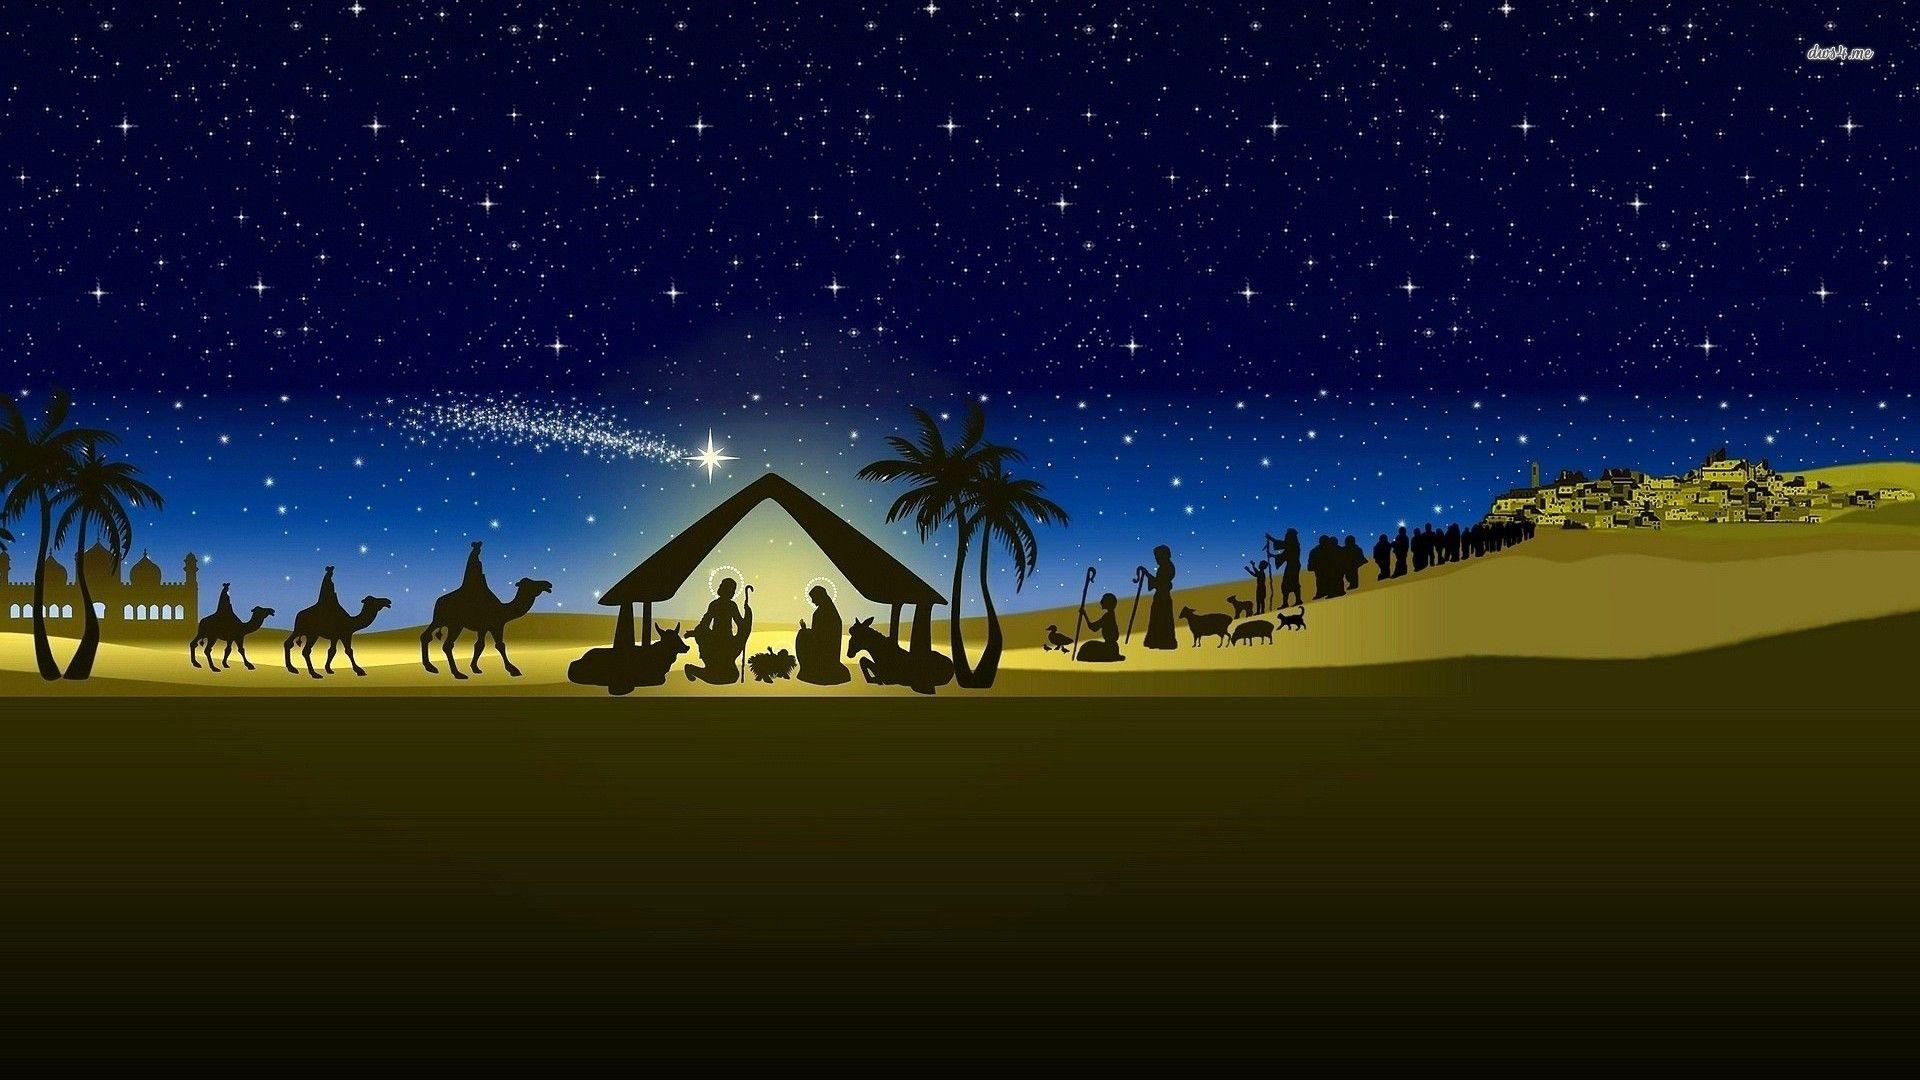 nativity scene backgrounds wallpaper cave